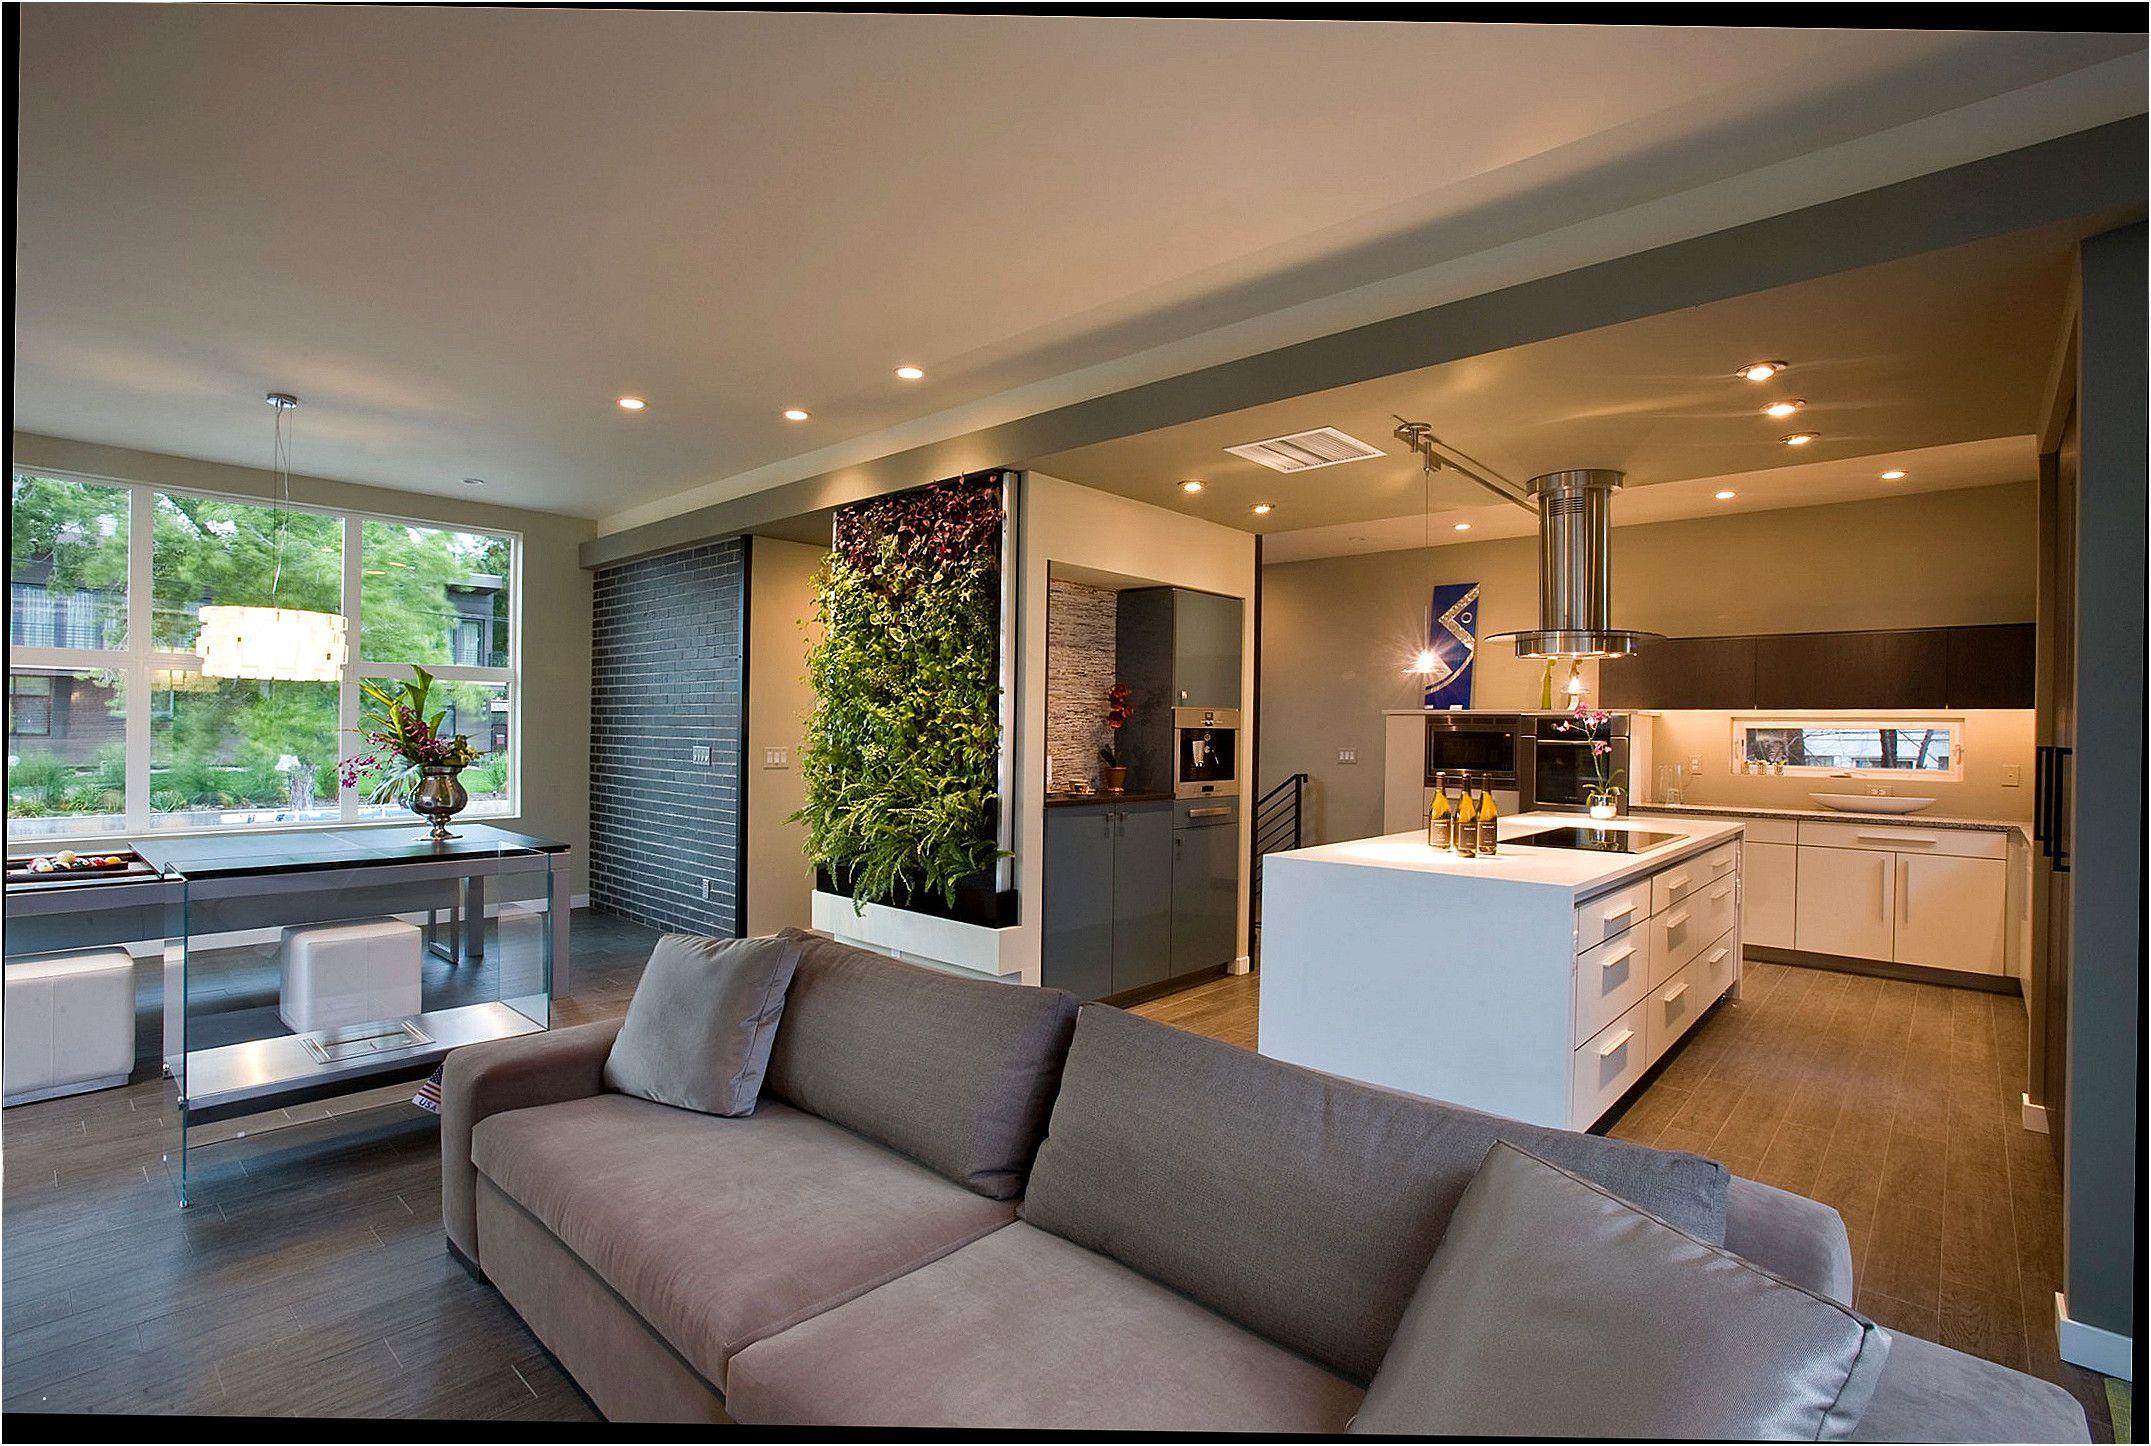 Best Of Kitchen Living Room Open Plan Design Ideas Casas Casa Dos Sonhos Cozinha